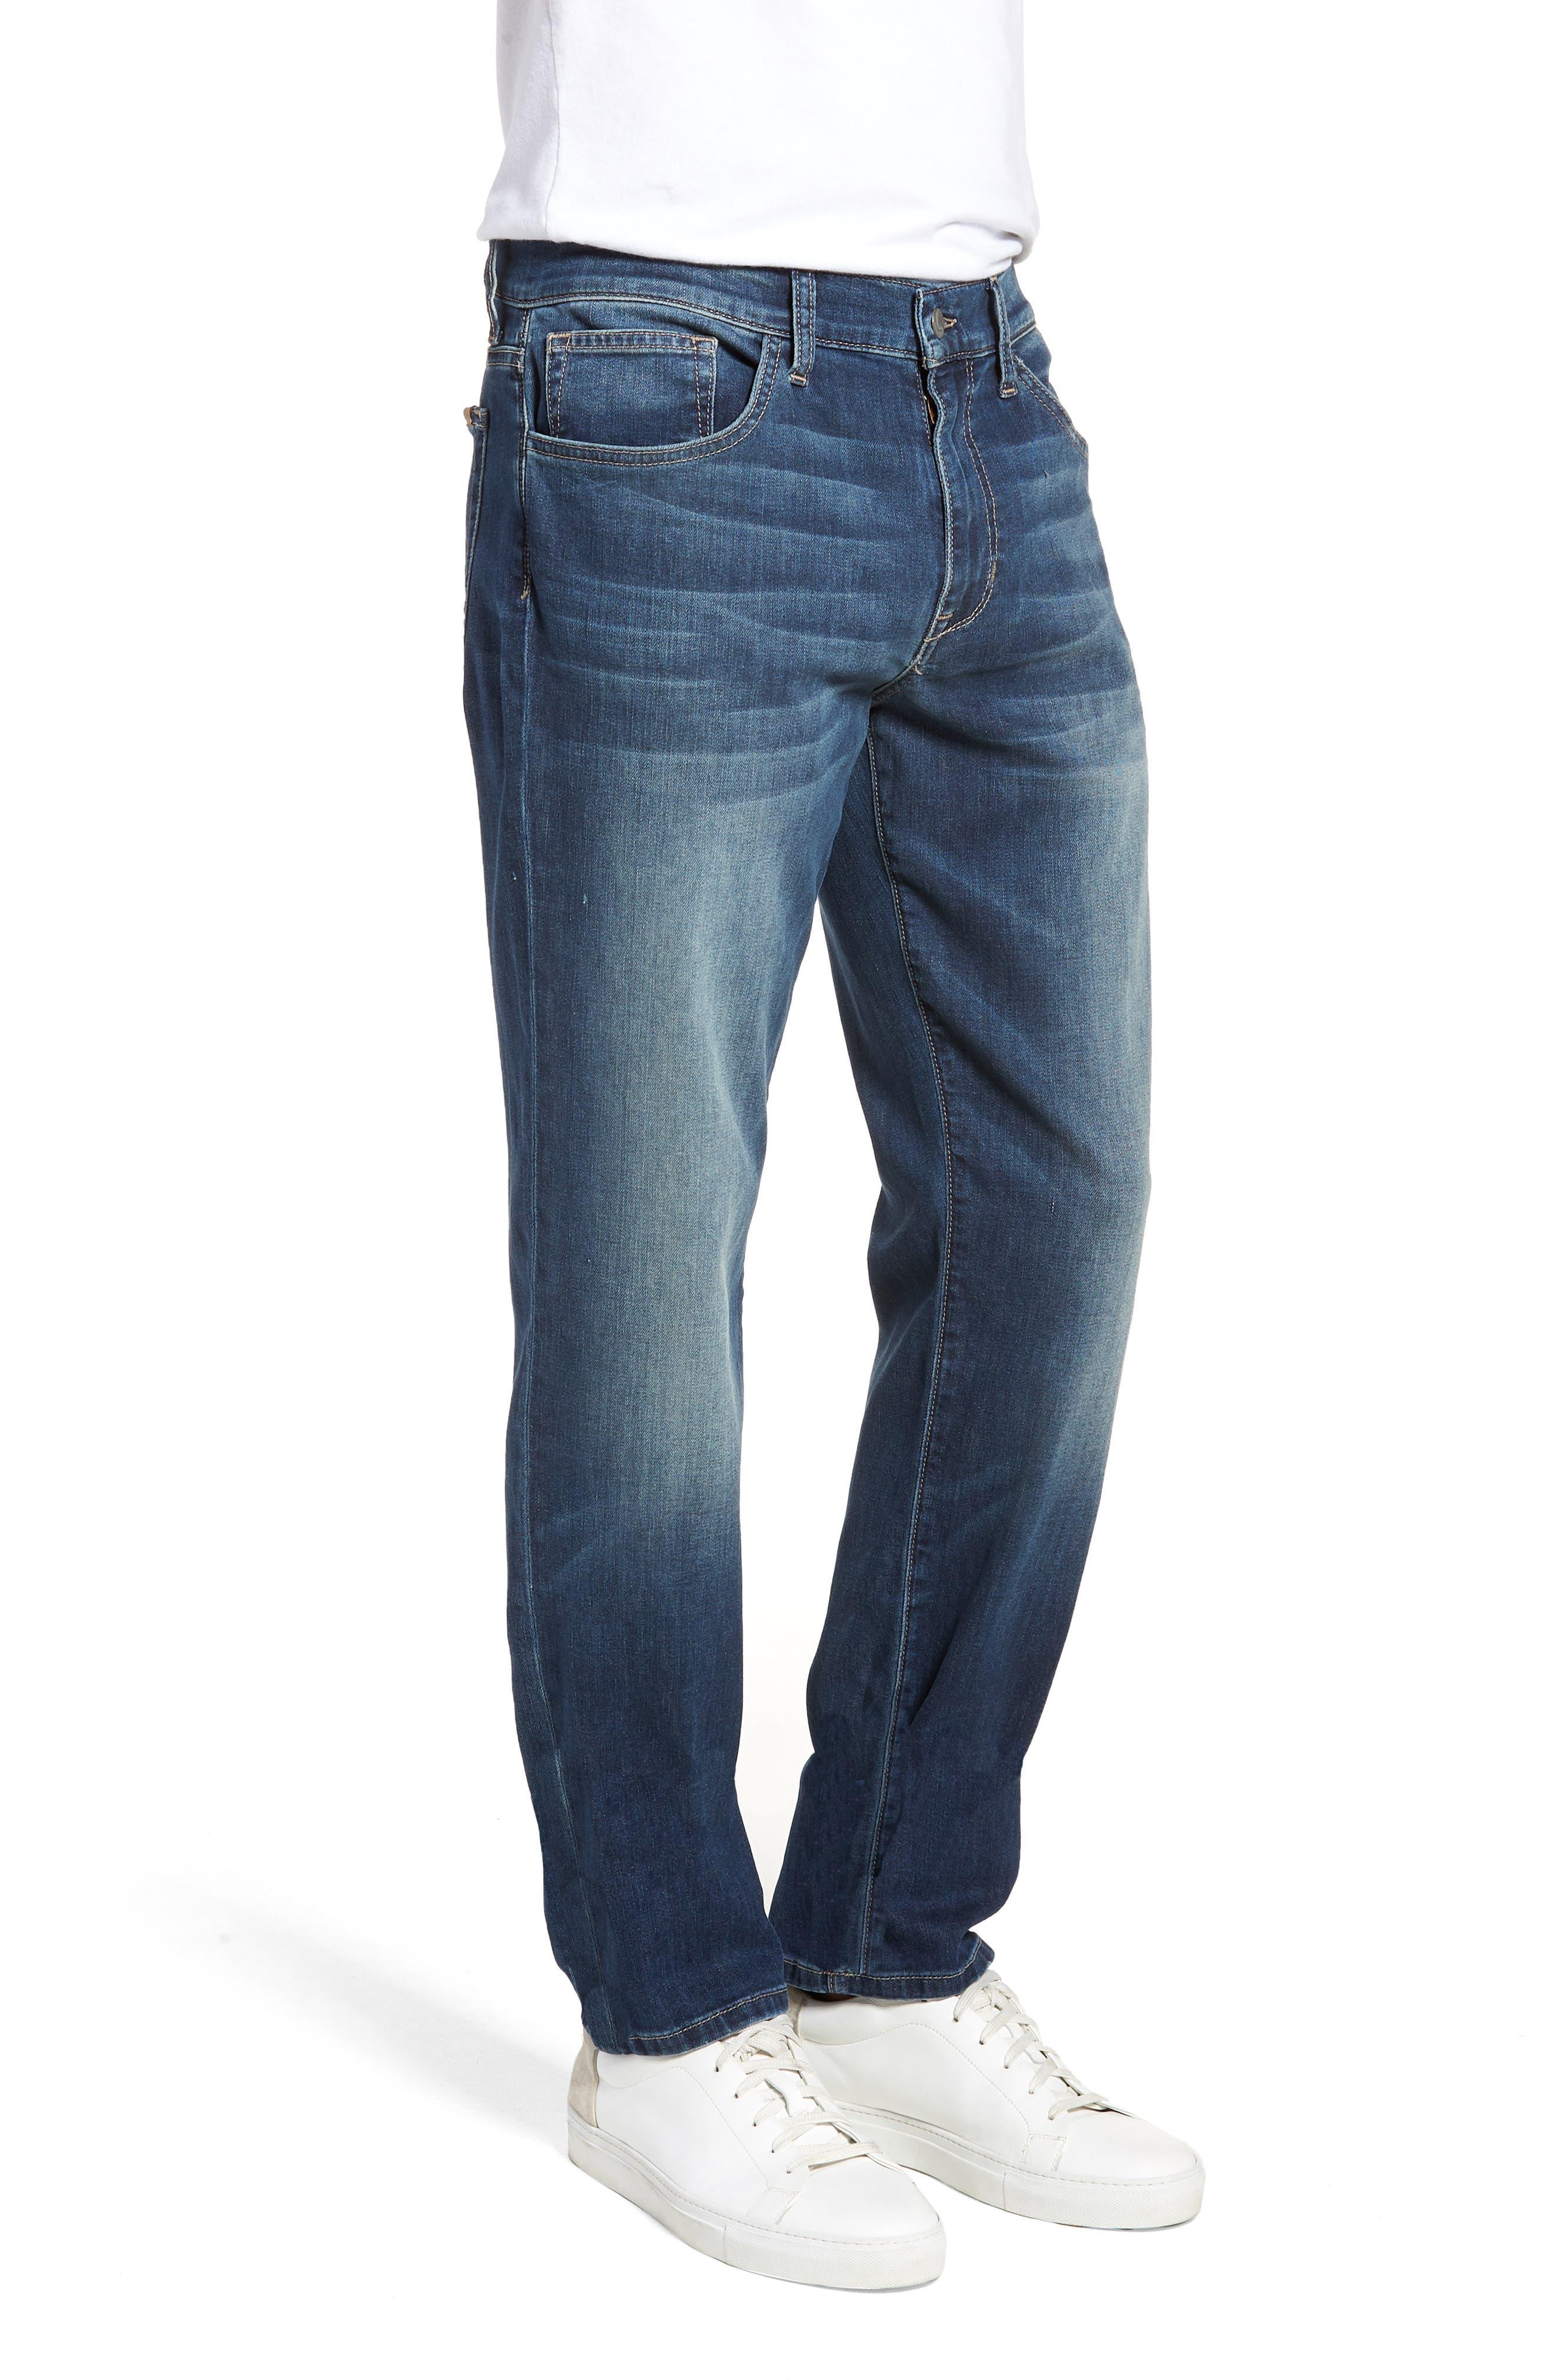 Brixton Slim Straight Fit Jeans,                             Alternate thumbnail 3, color,                             Brady